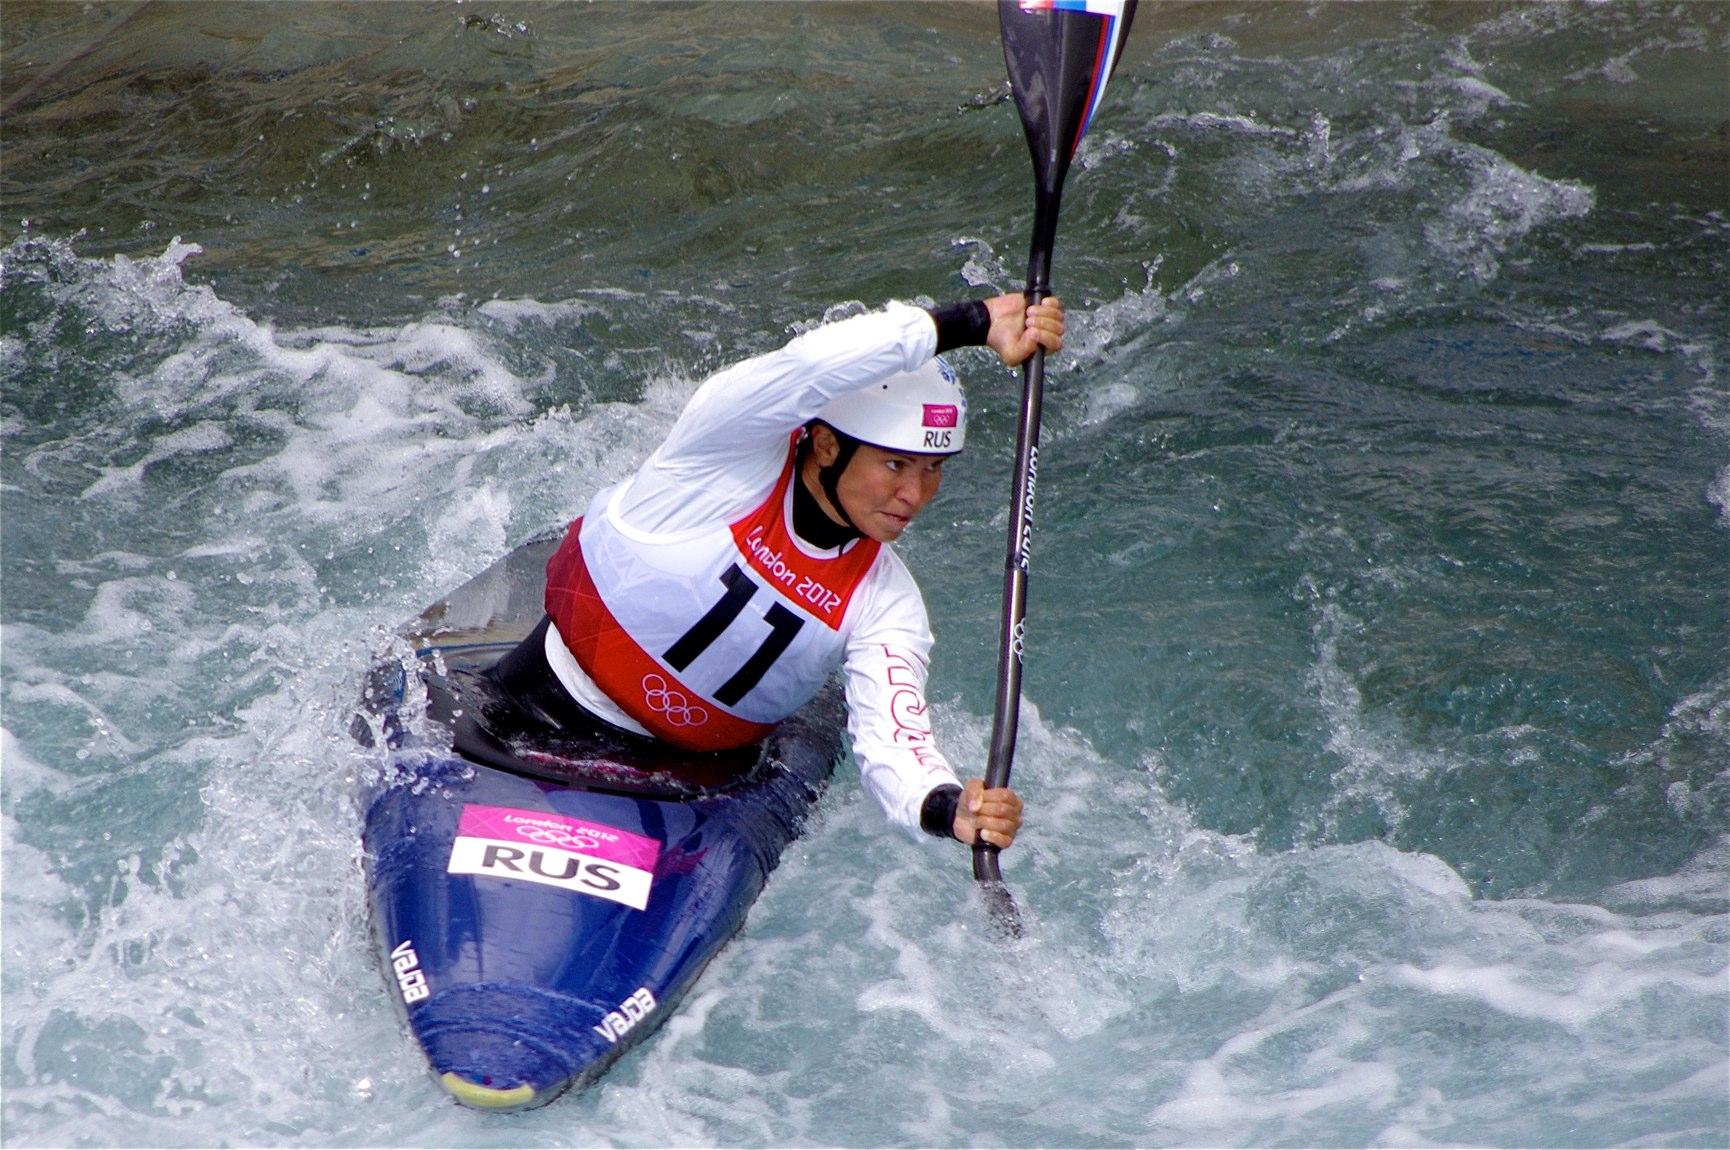 FileSlalom Canoeing 2012 Olympics W K1 RUS Marta Kharitonova 2